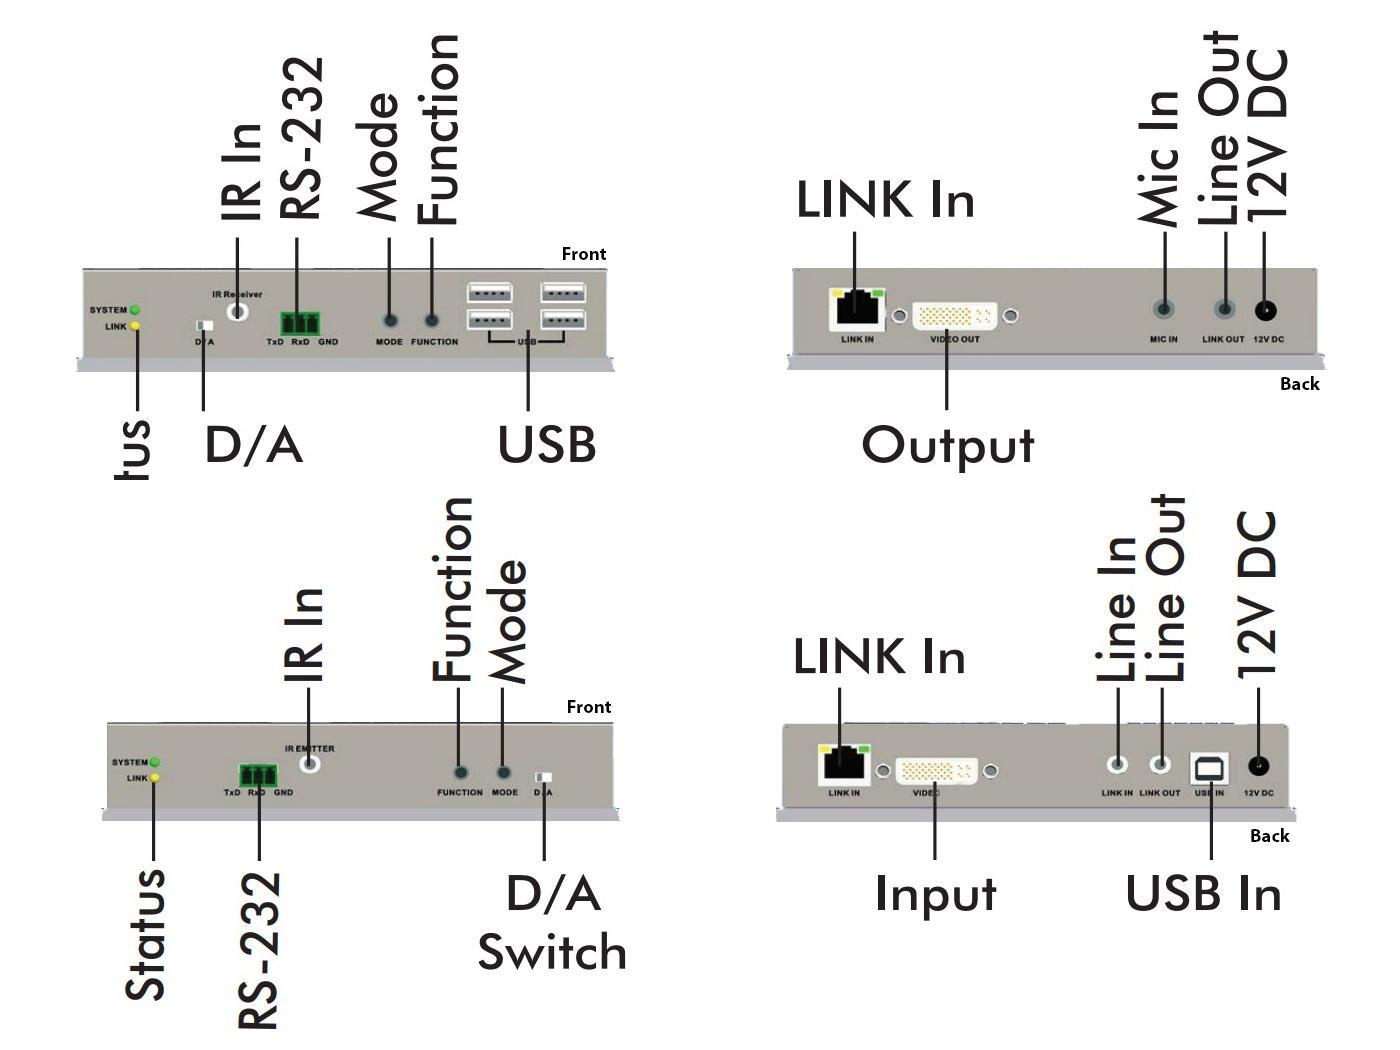 Apantac KVM-SET-12-II HDMI/DVI/VGA(DVI-I connector)/USB KVM Extender (Transmitter/Receiver) Kit over Gigabit Ethernet LAN